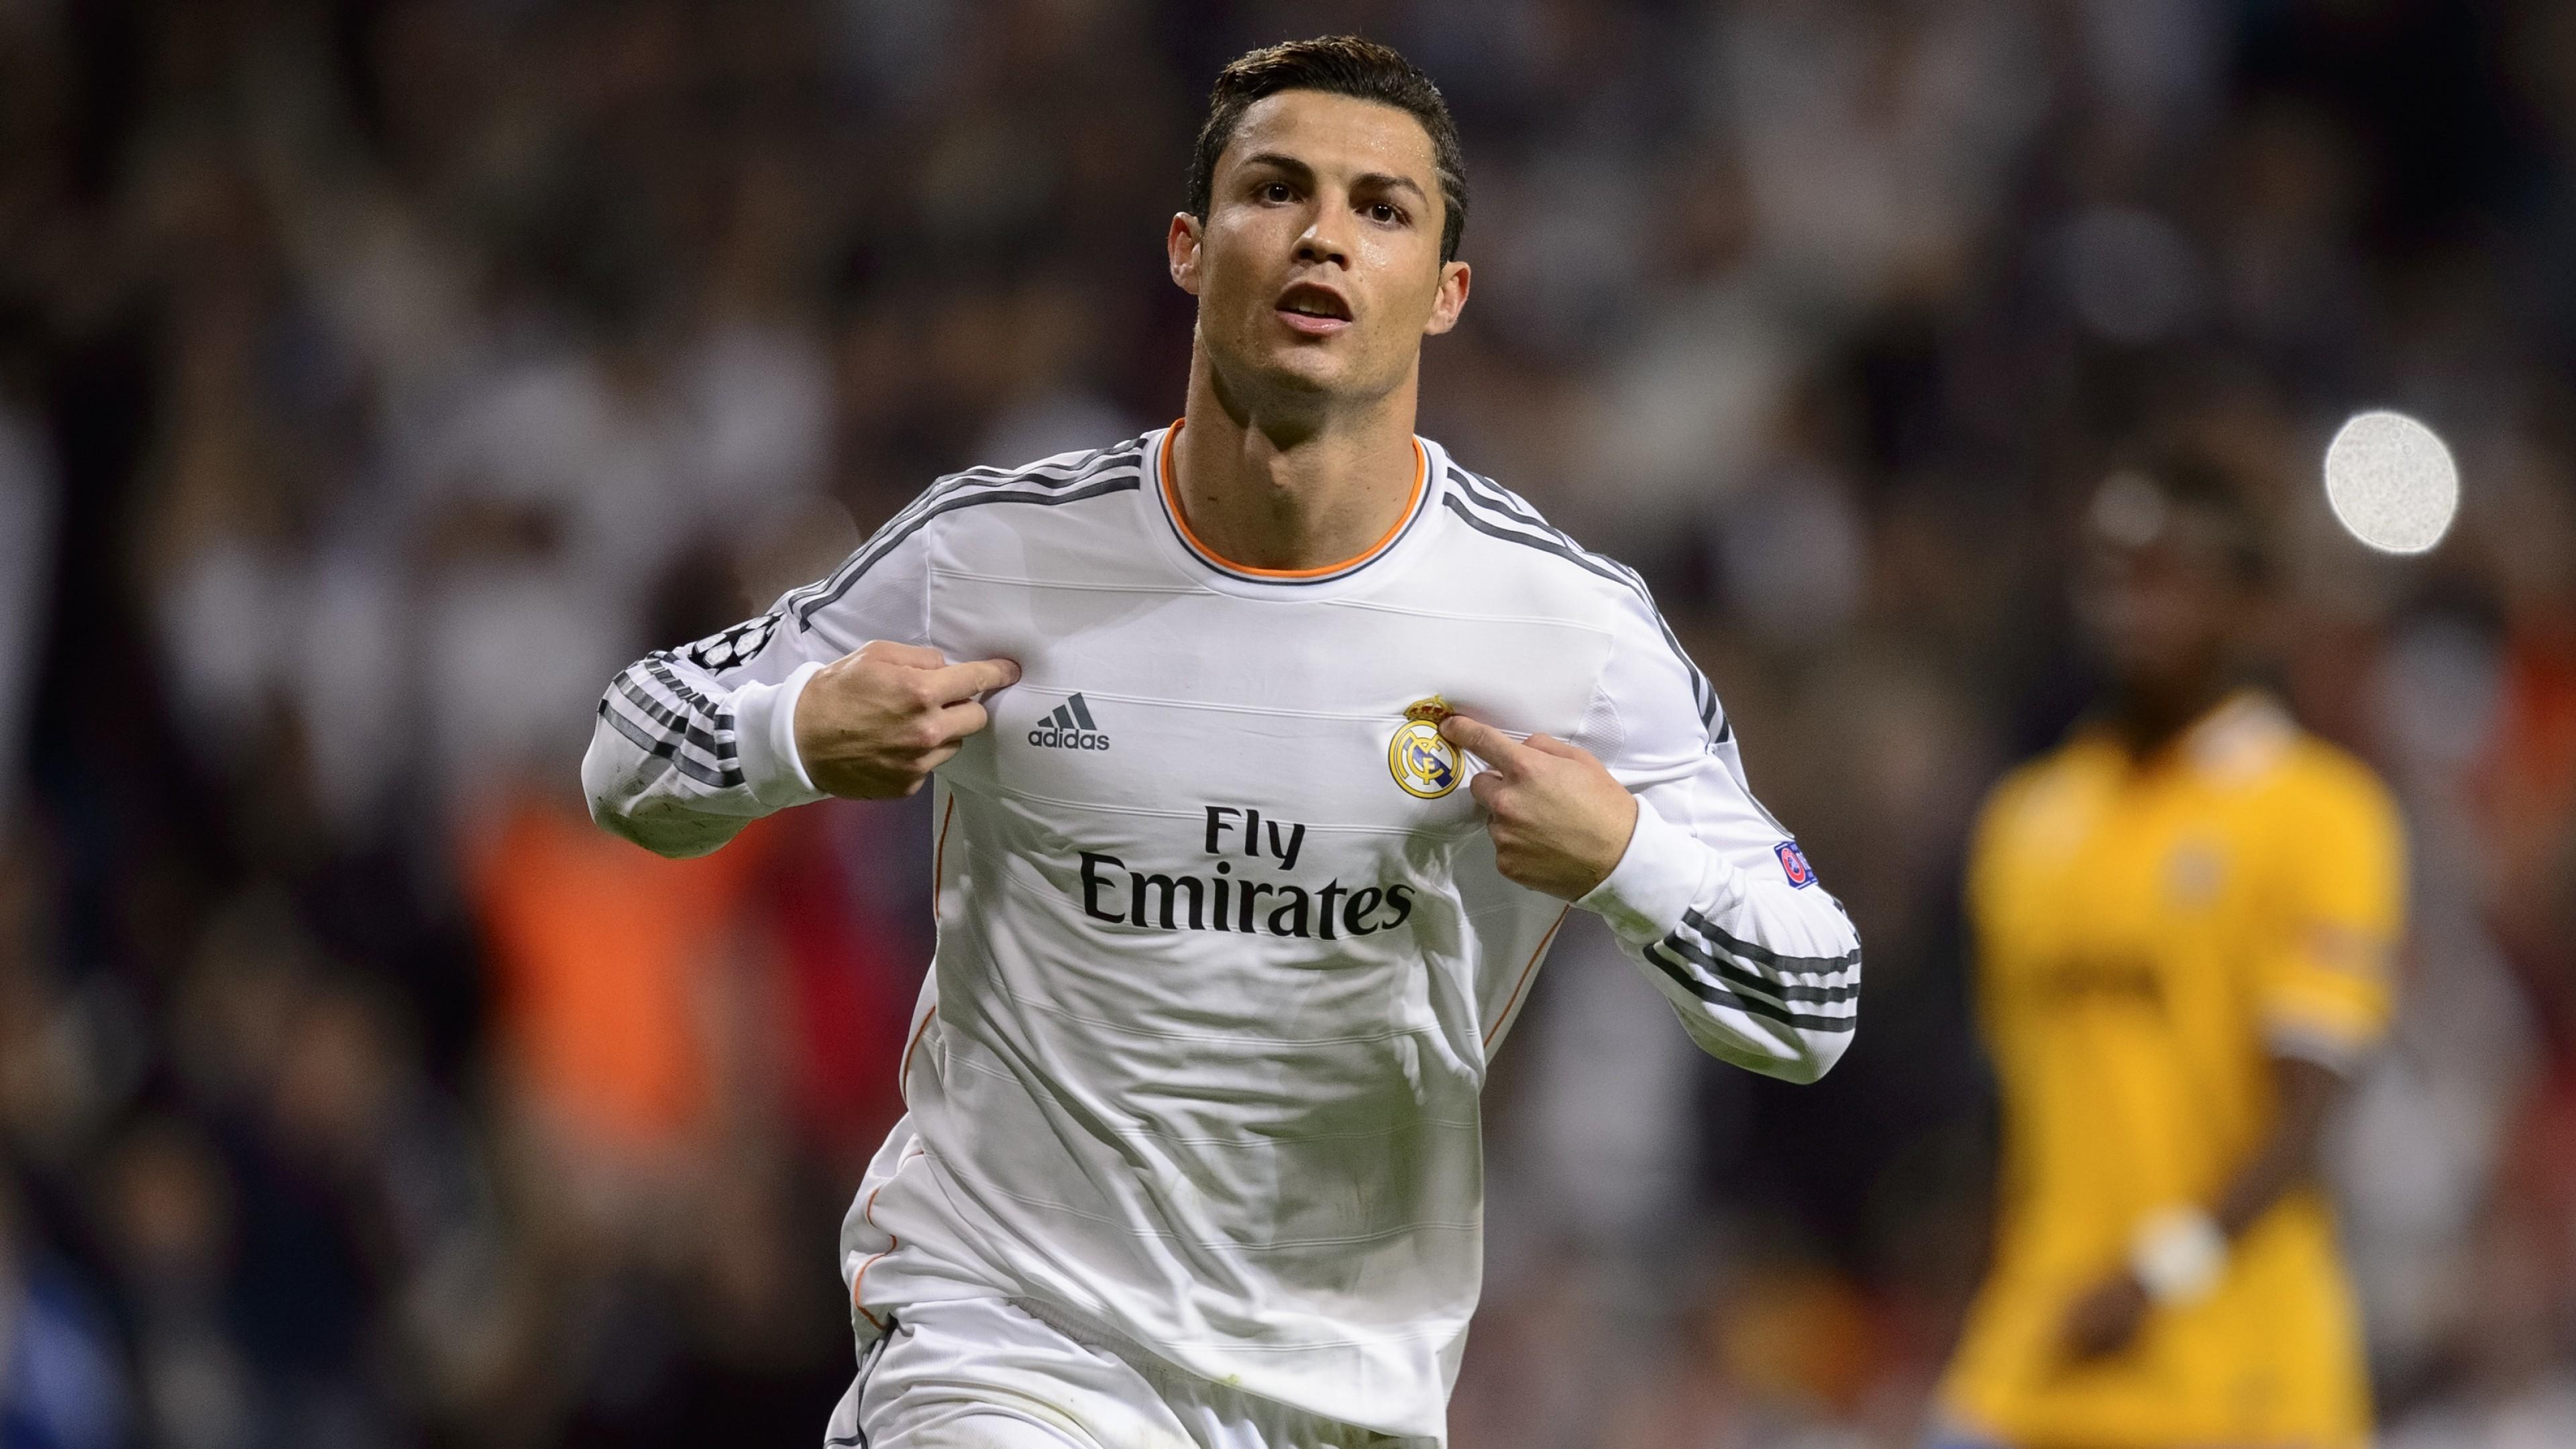 Cristiano Ronaldo, Footballer, Best player, Soccer, HD